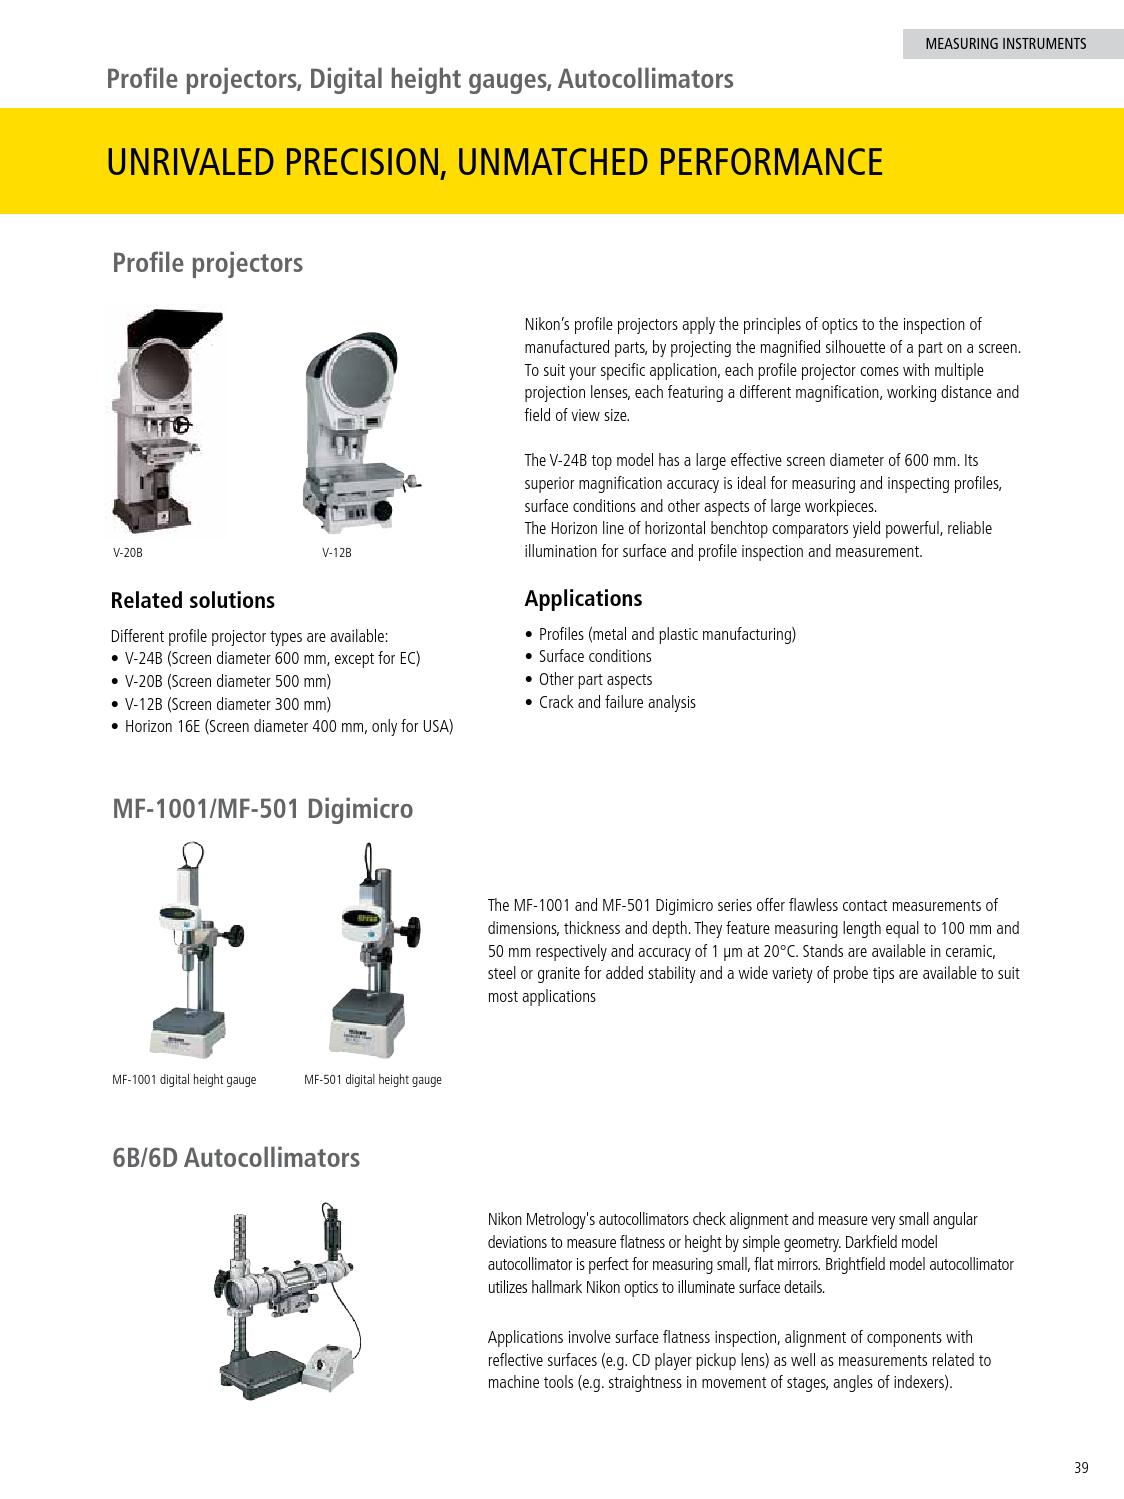 Nikon Metrology Solutions by Nikon - issuu